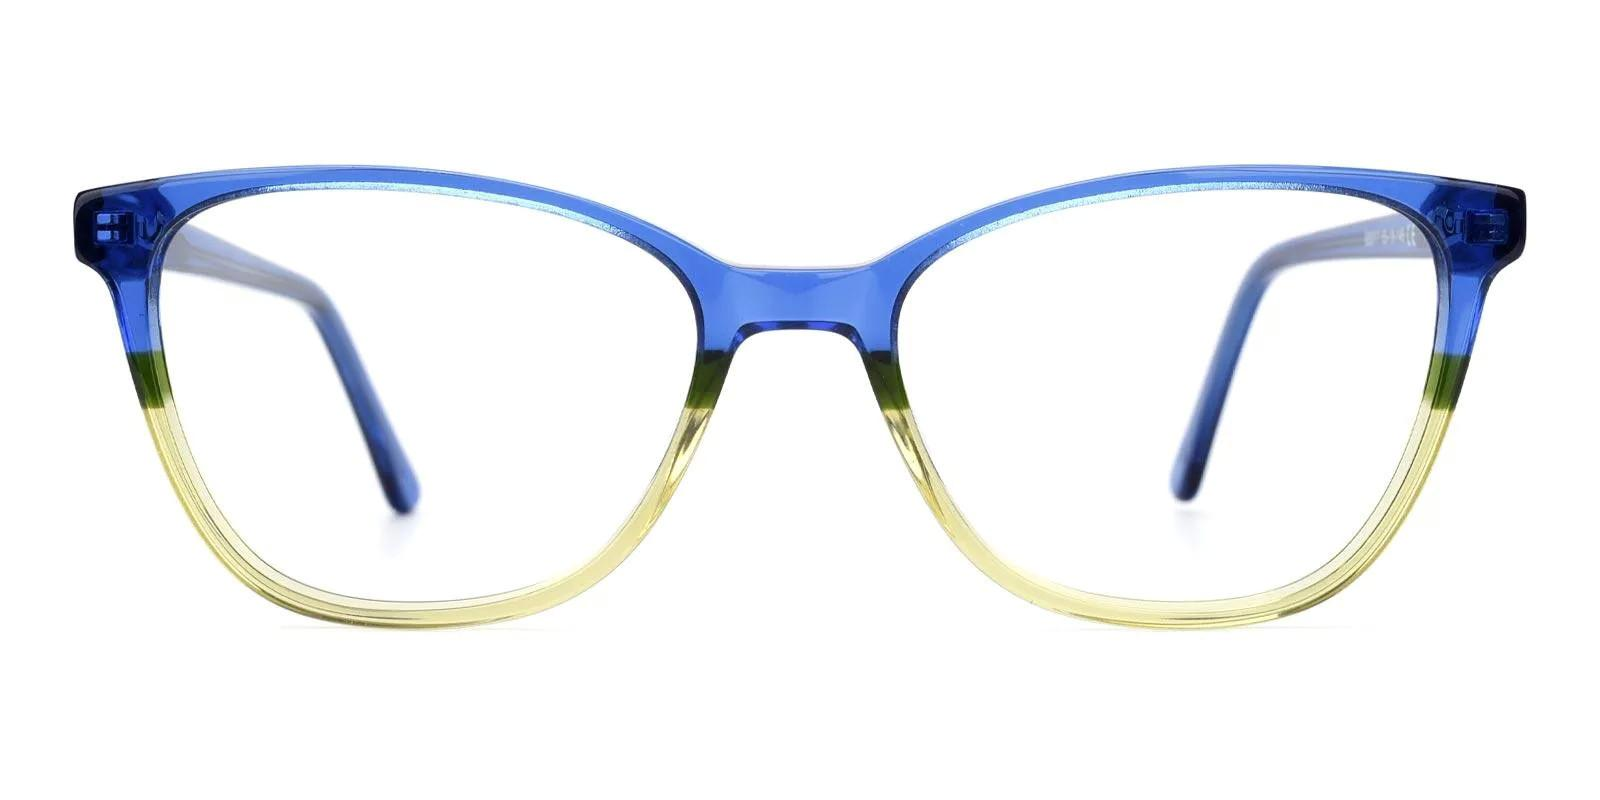 Rosemary Blue Acetate Eyeglasses , Fashion , SpringHinges , UniversalBridgeFit Frames from ABBE Glasses